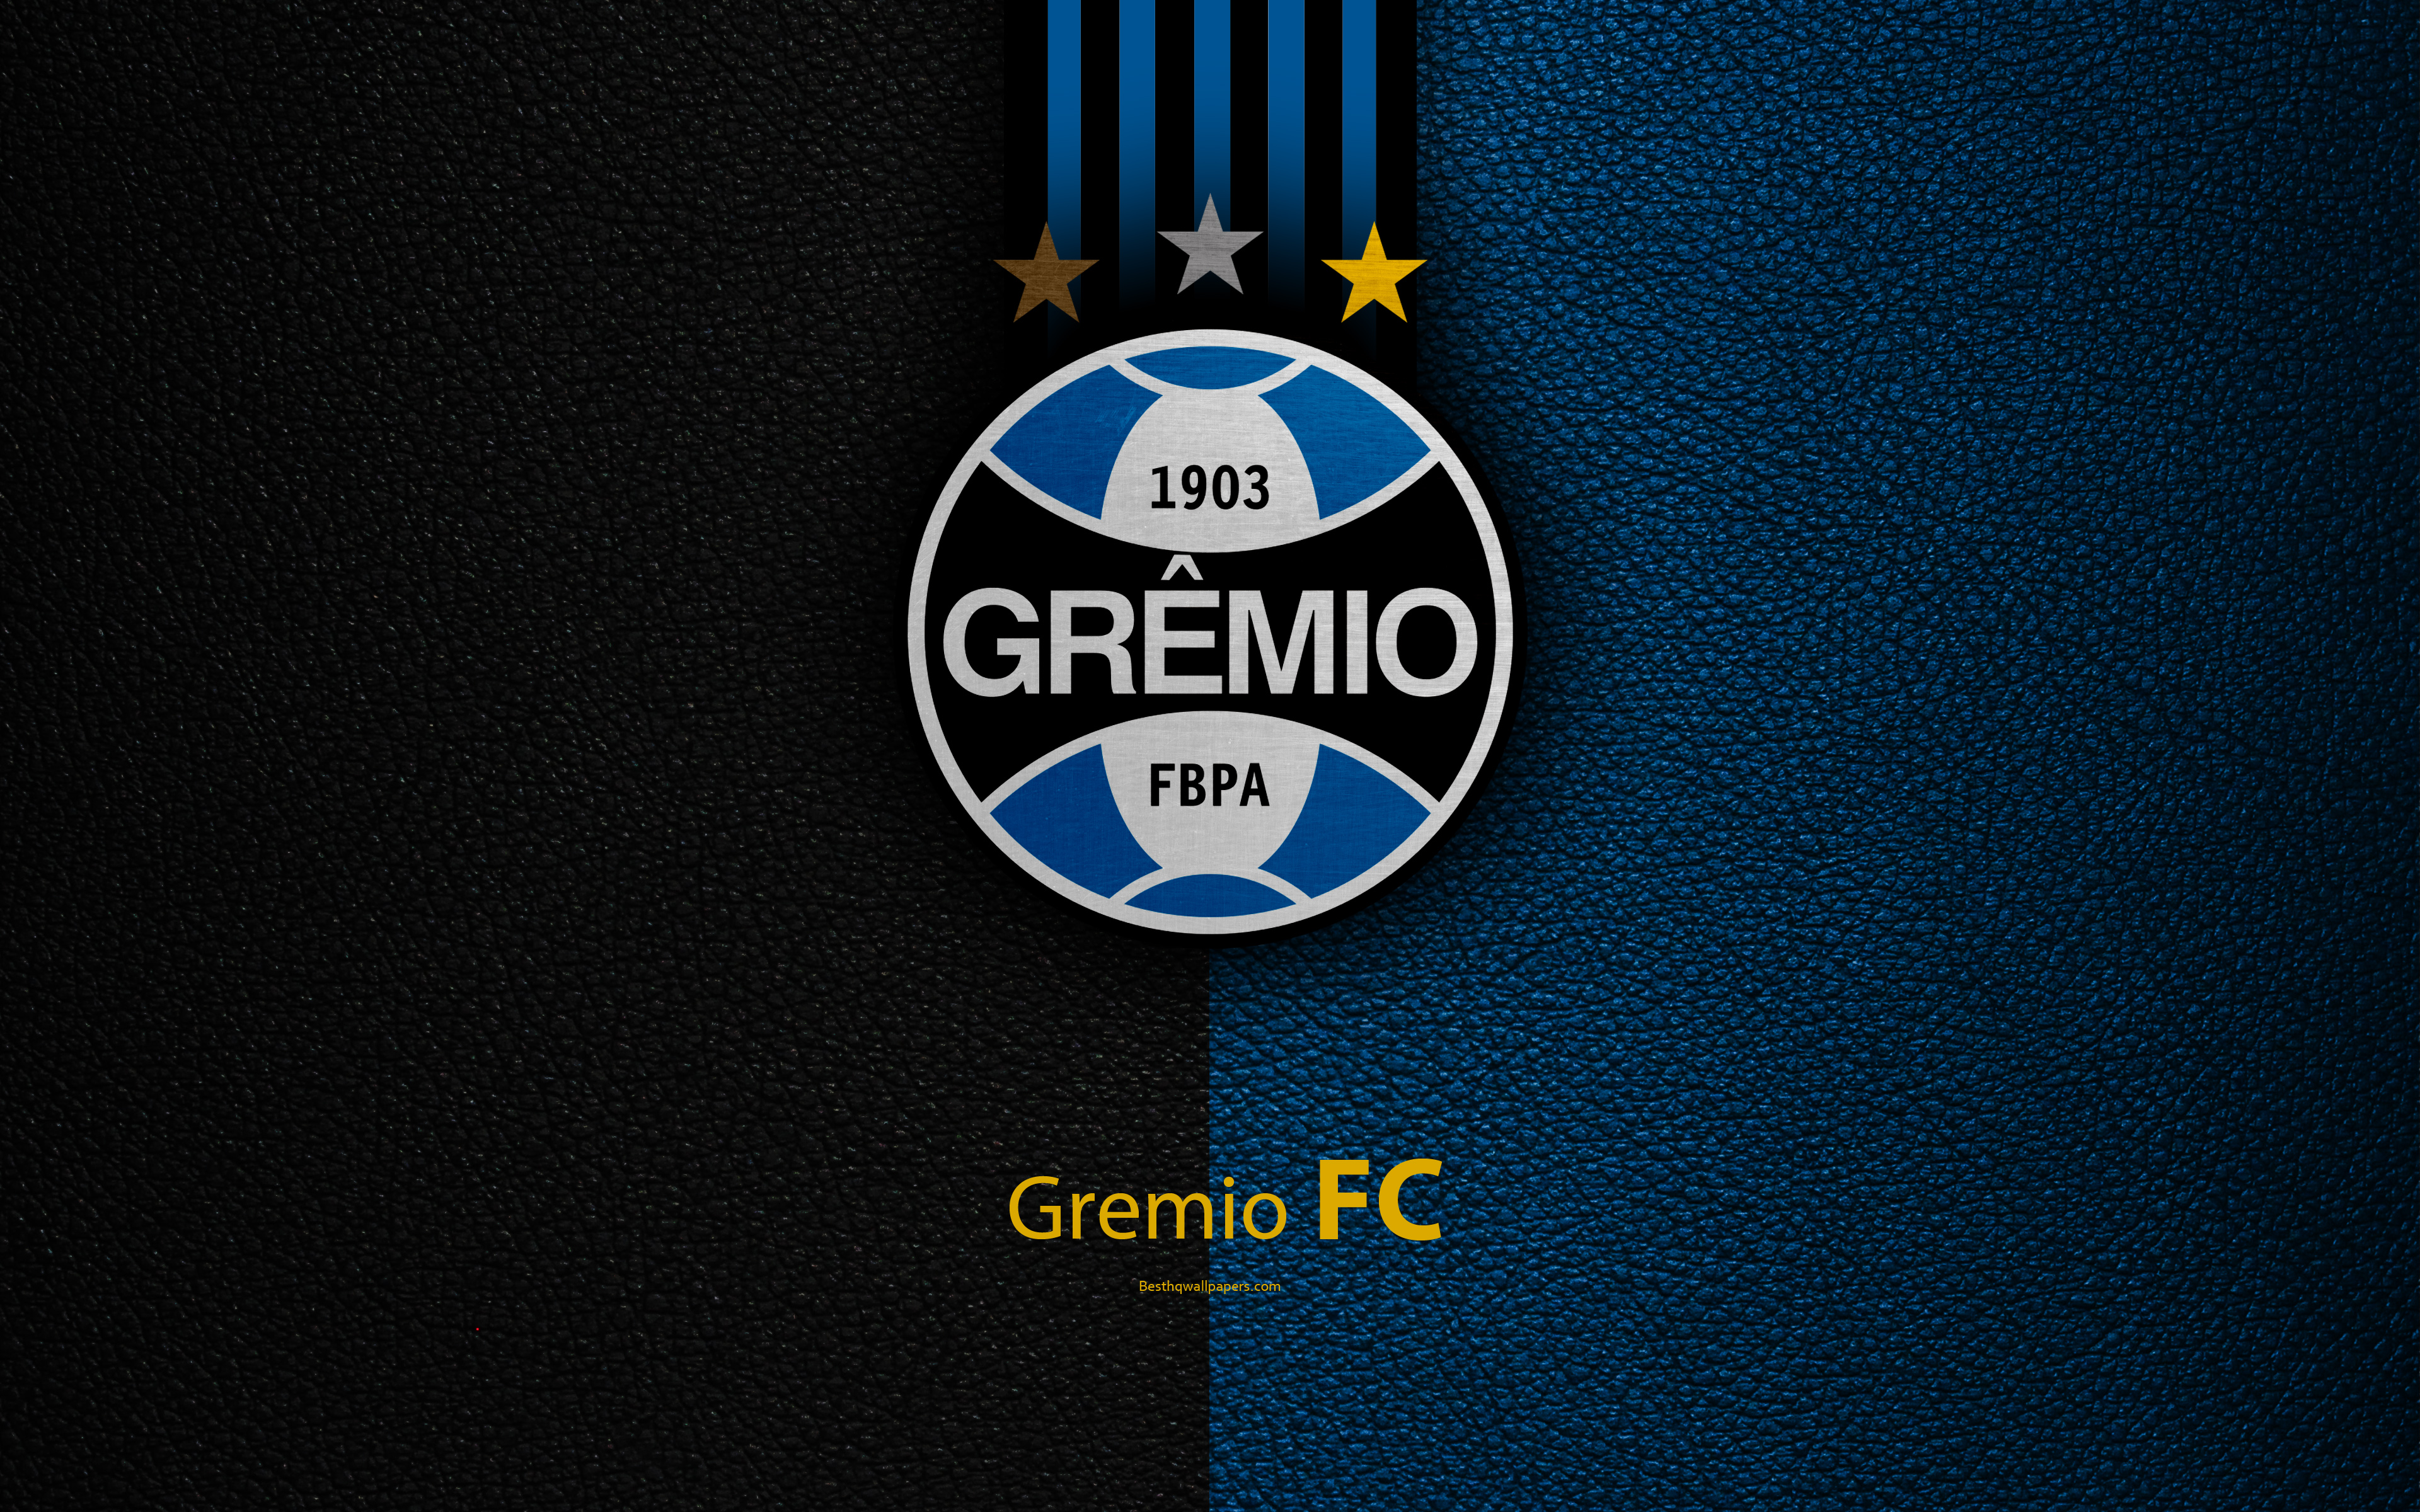 Download wallpapers Gremio FC 4K Brazilian football club 3840x2400